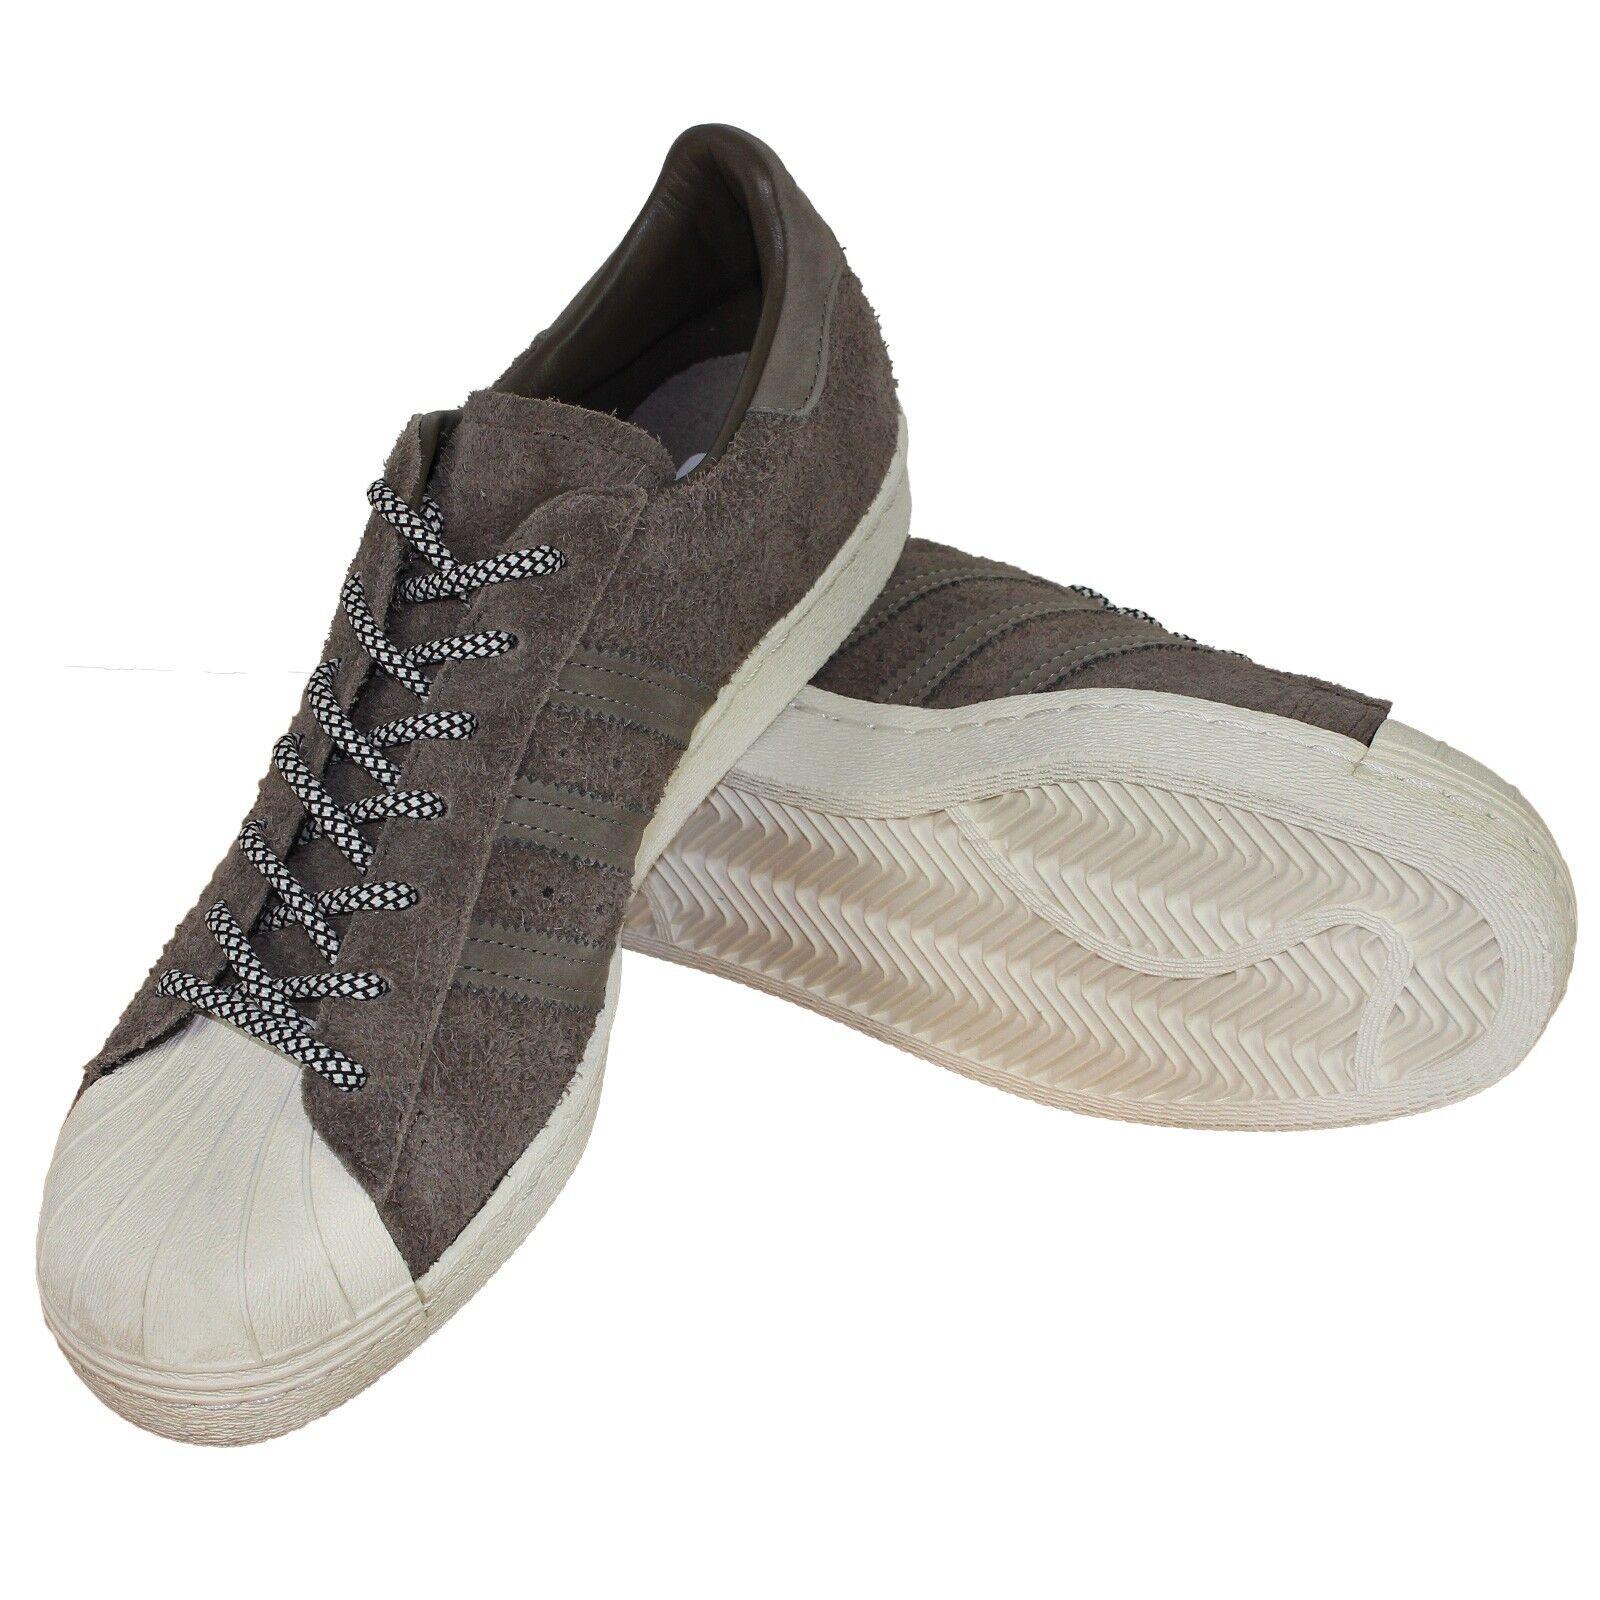 Adidas Originals Urbain Superstar S75848 Daim Chaussures